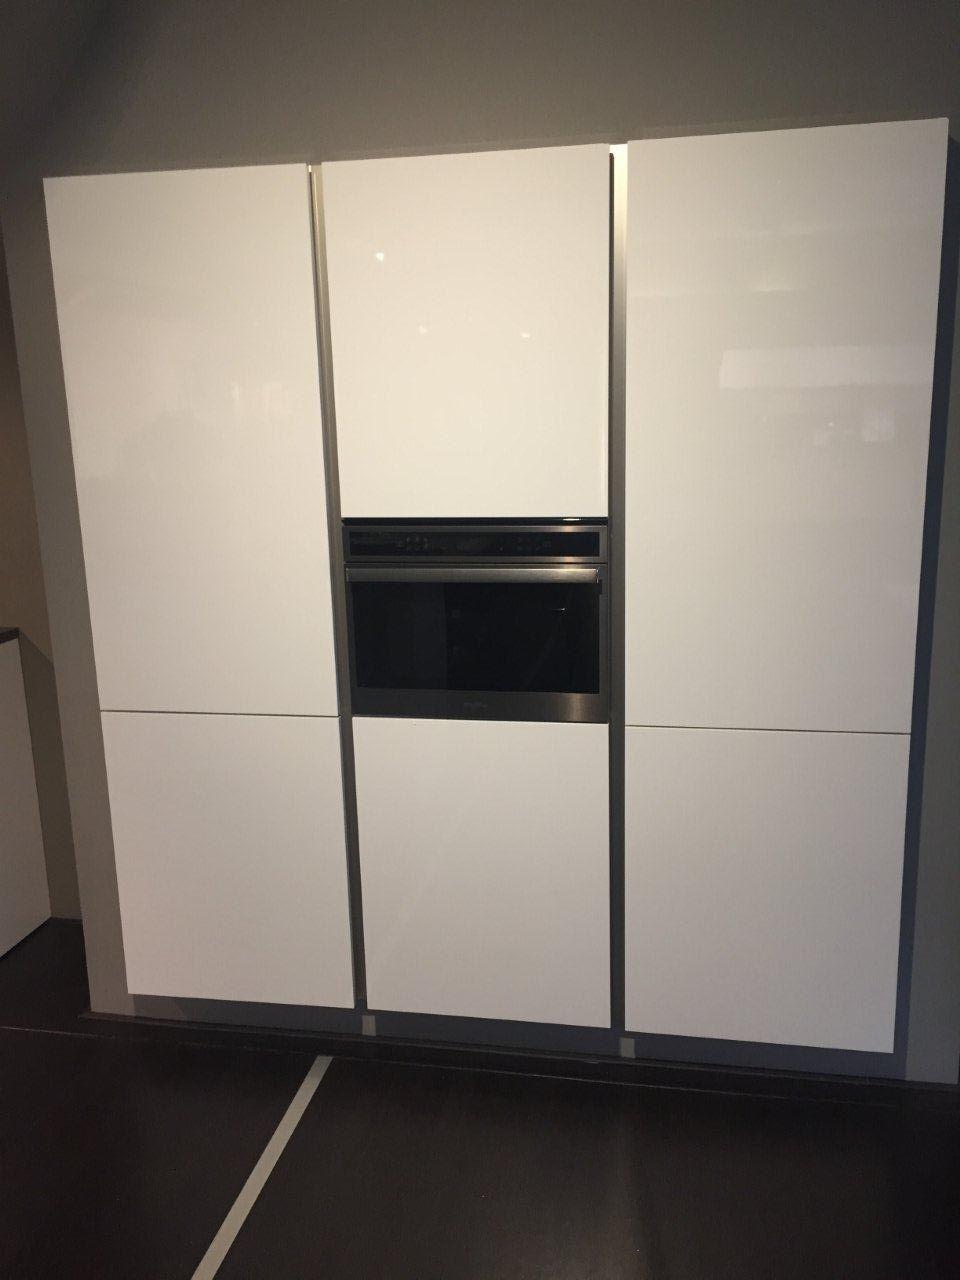 Hoogglans witte greeploze design keuken